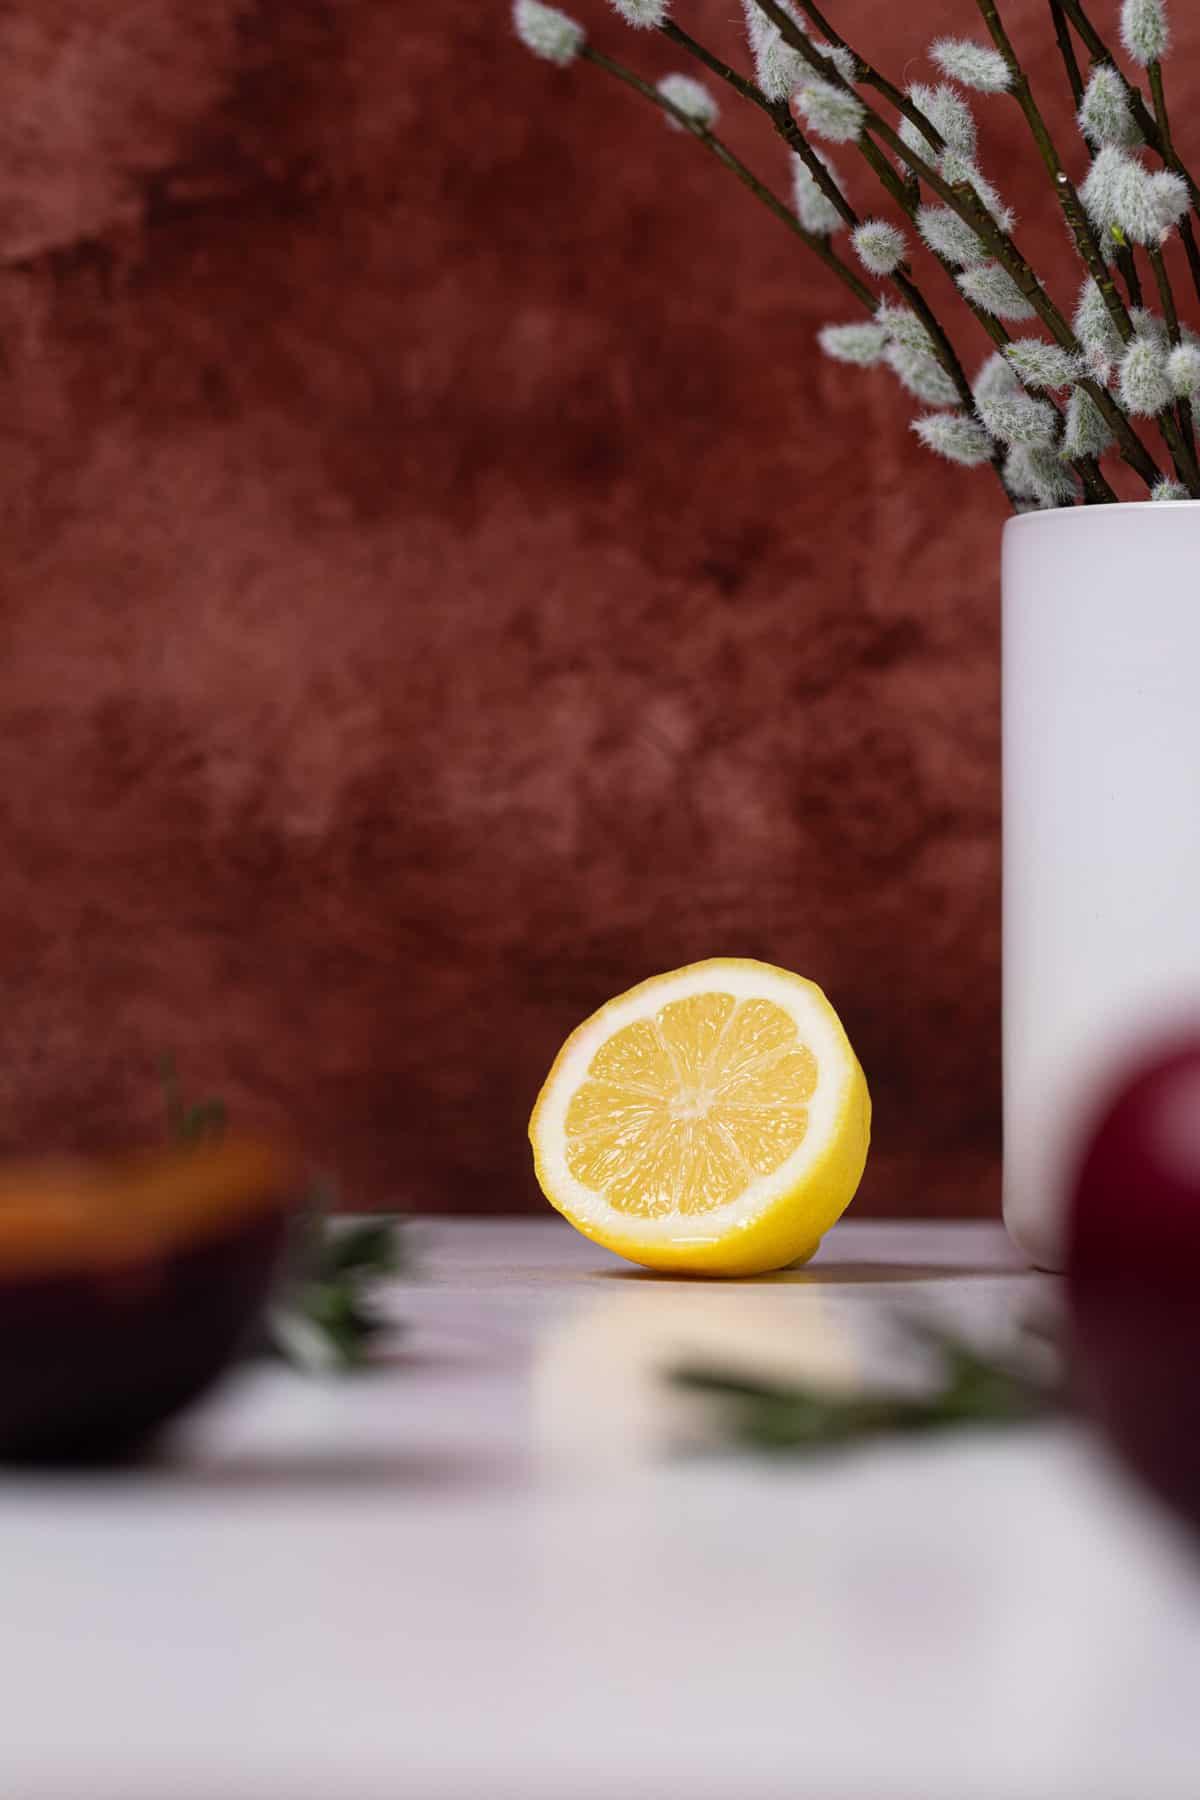 half of a lemon on a white table